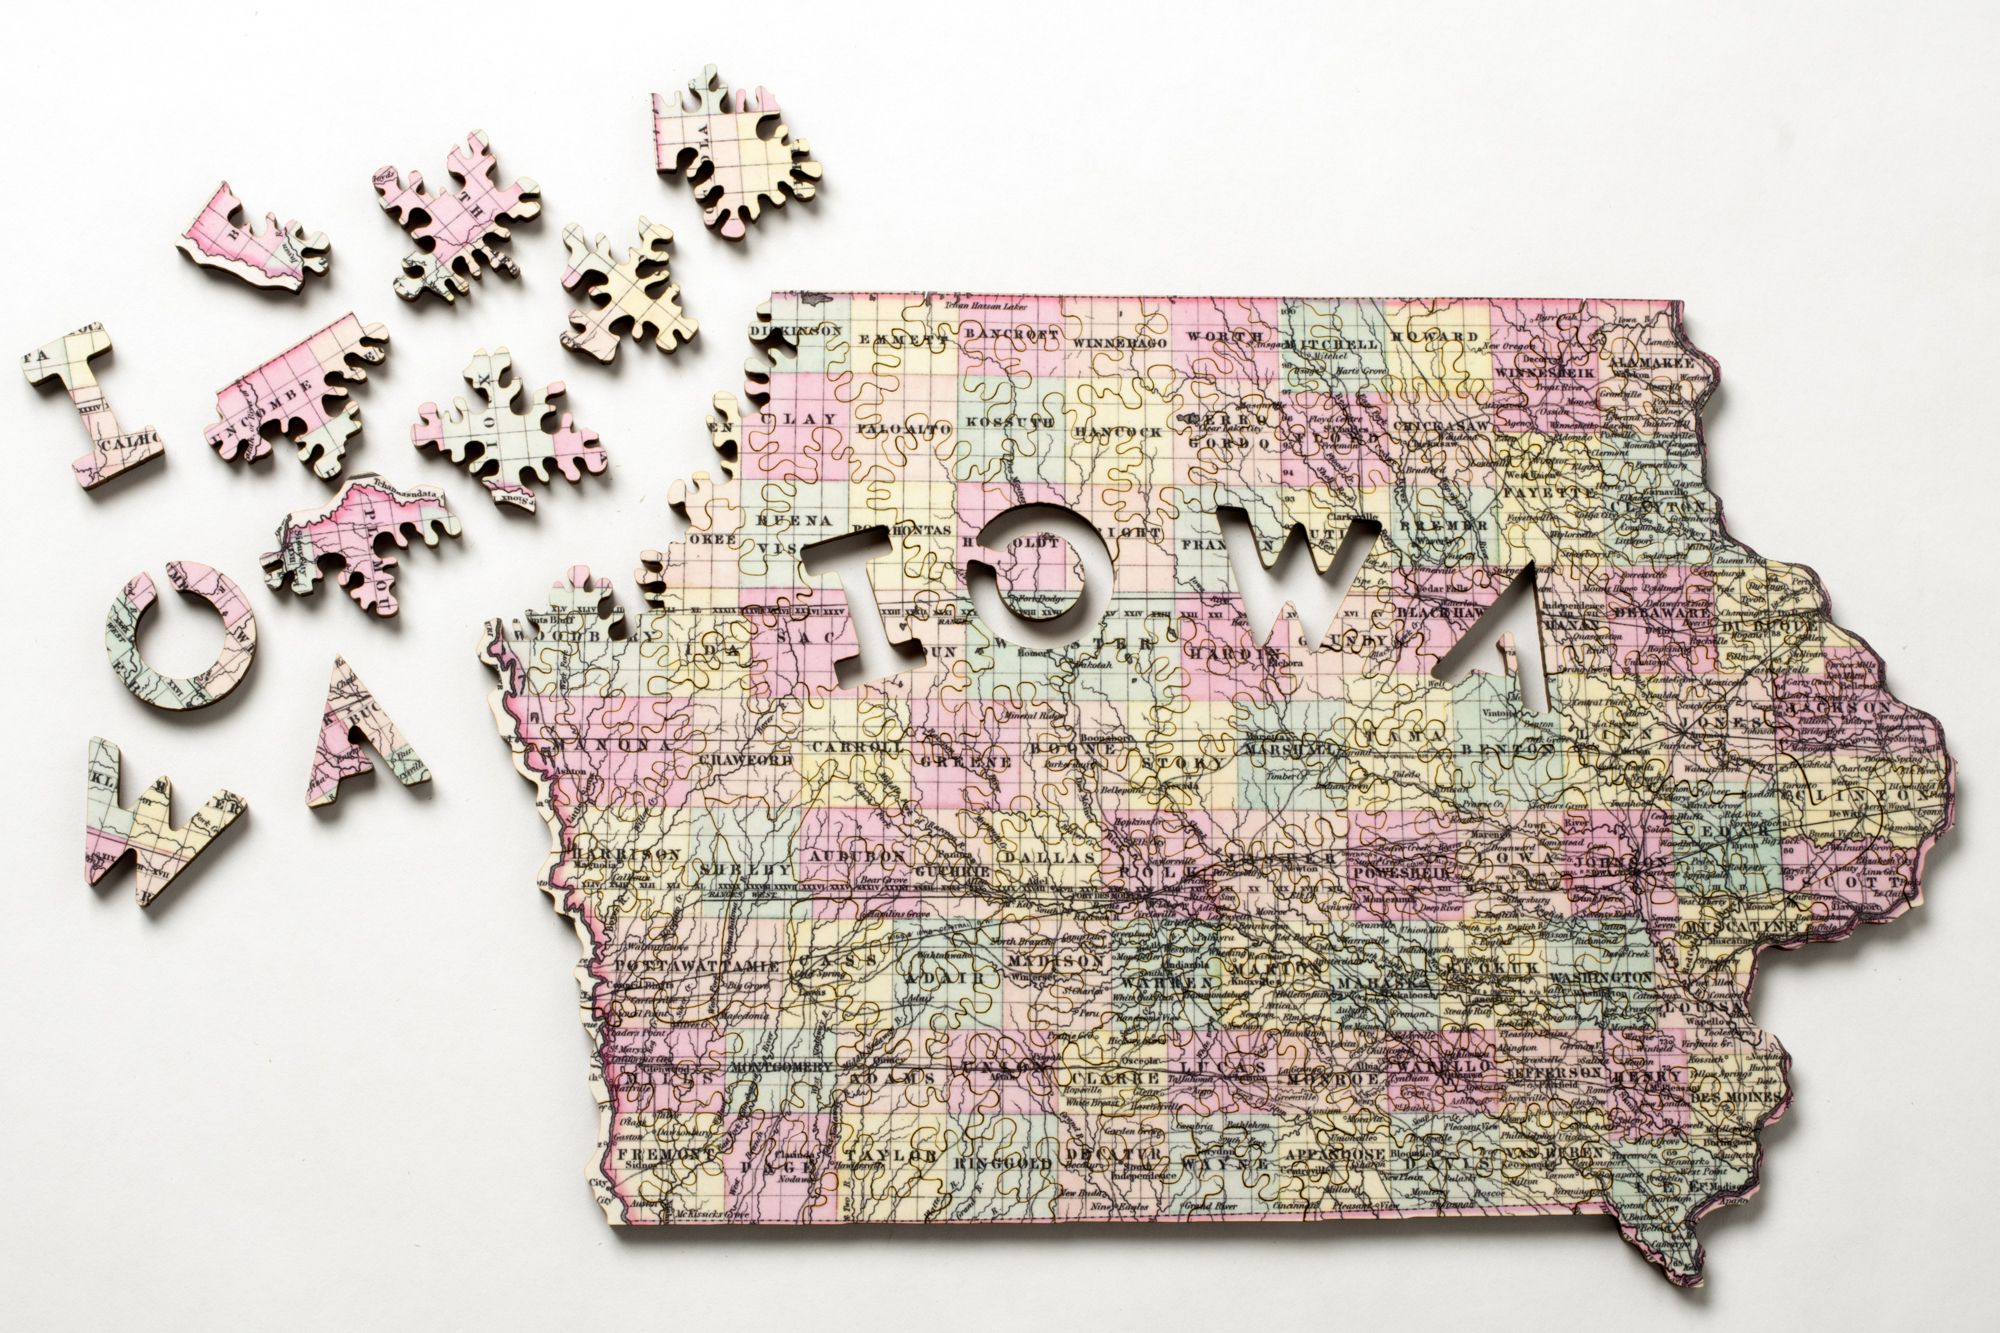 Geode, Maze, and Custom Jigsaw Puzzles | Nervous System blog